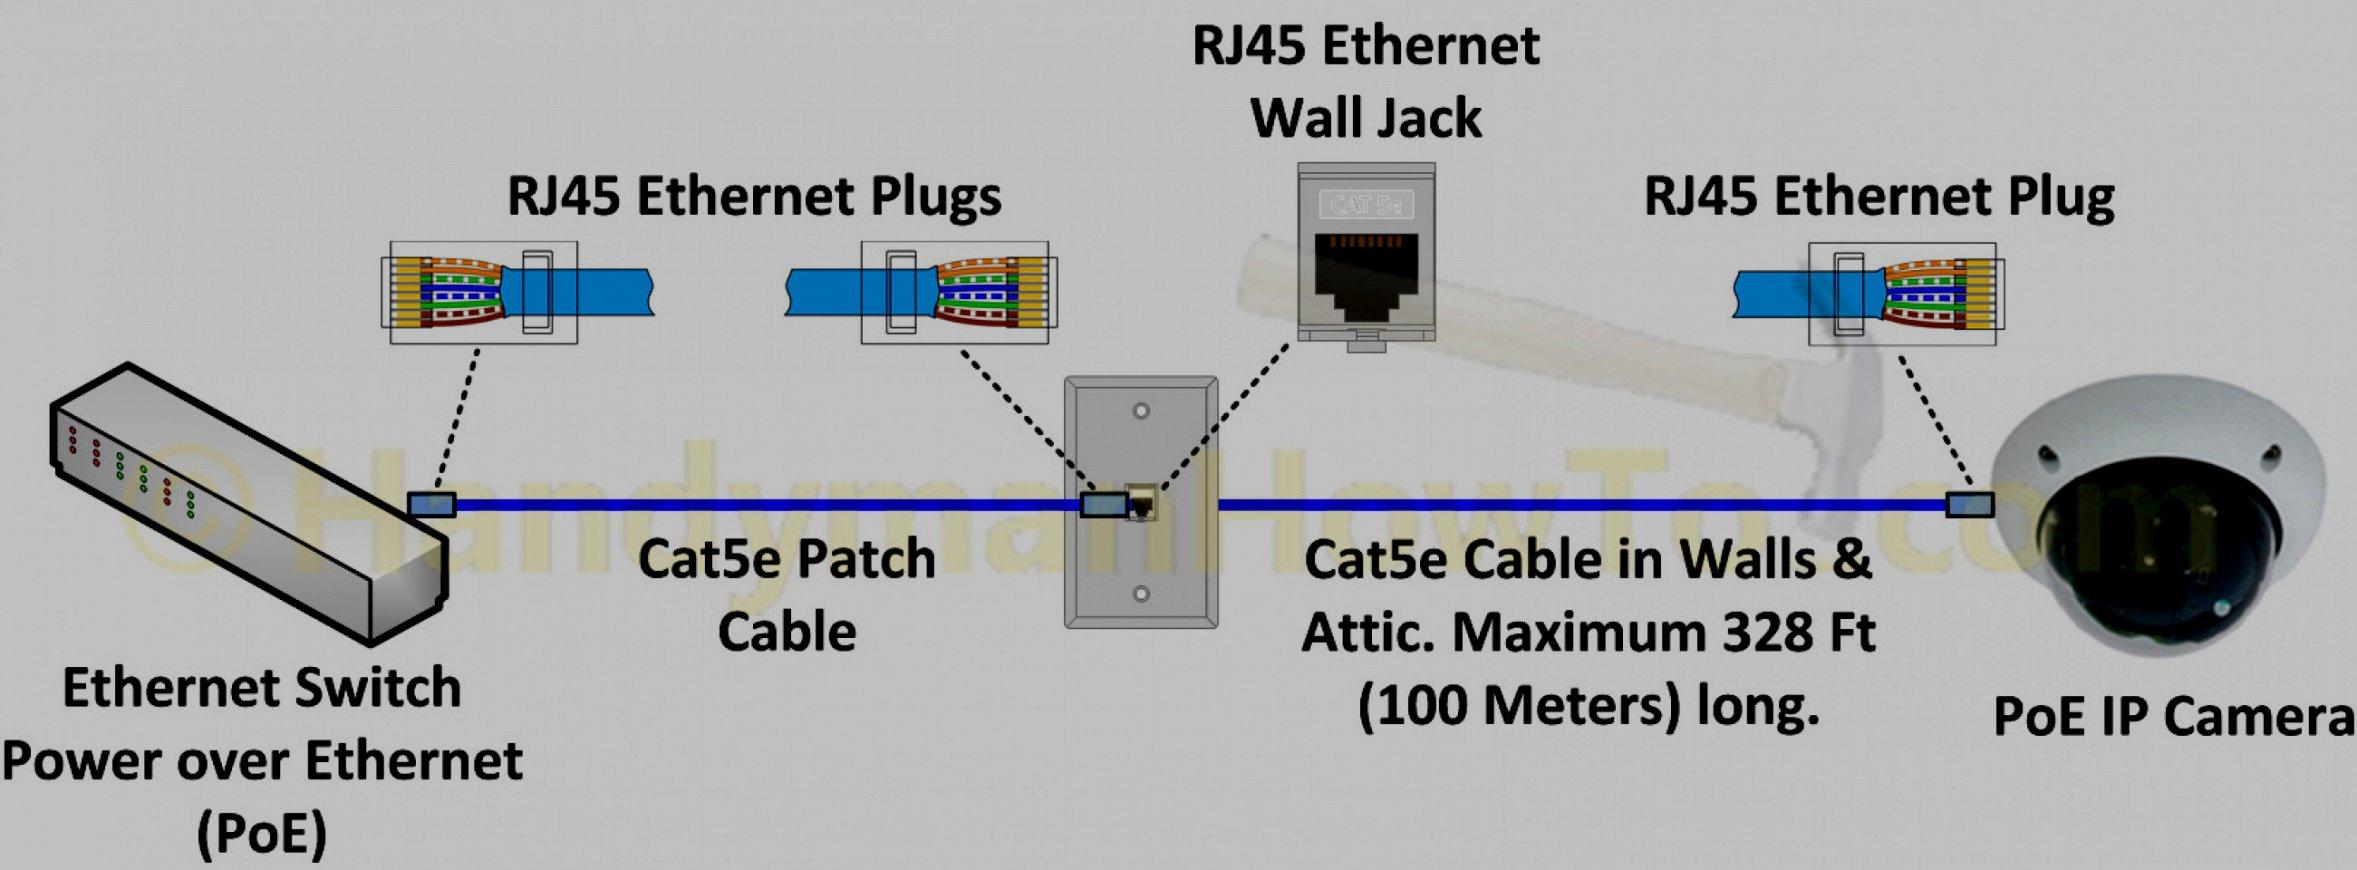 Outstanding Rj45 Punch Block Wiring Diagram Basic Electronics Wiring Diagram Wiring Digital Resources Ntnesshebarightsorg